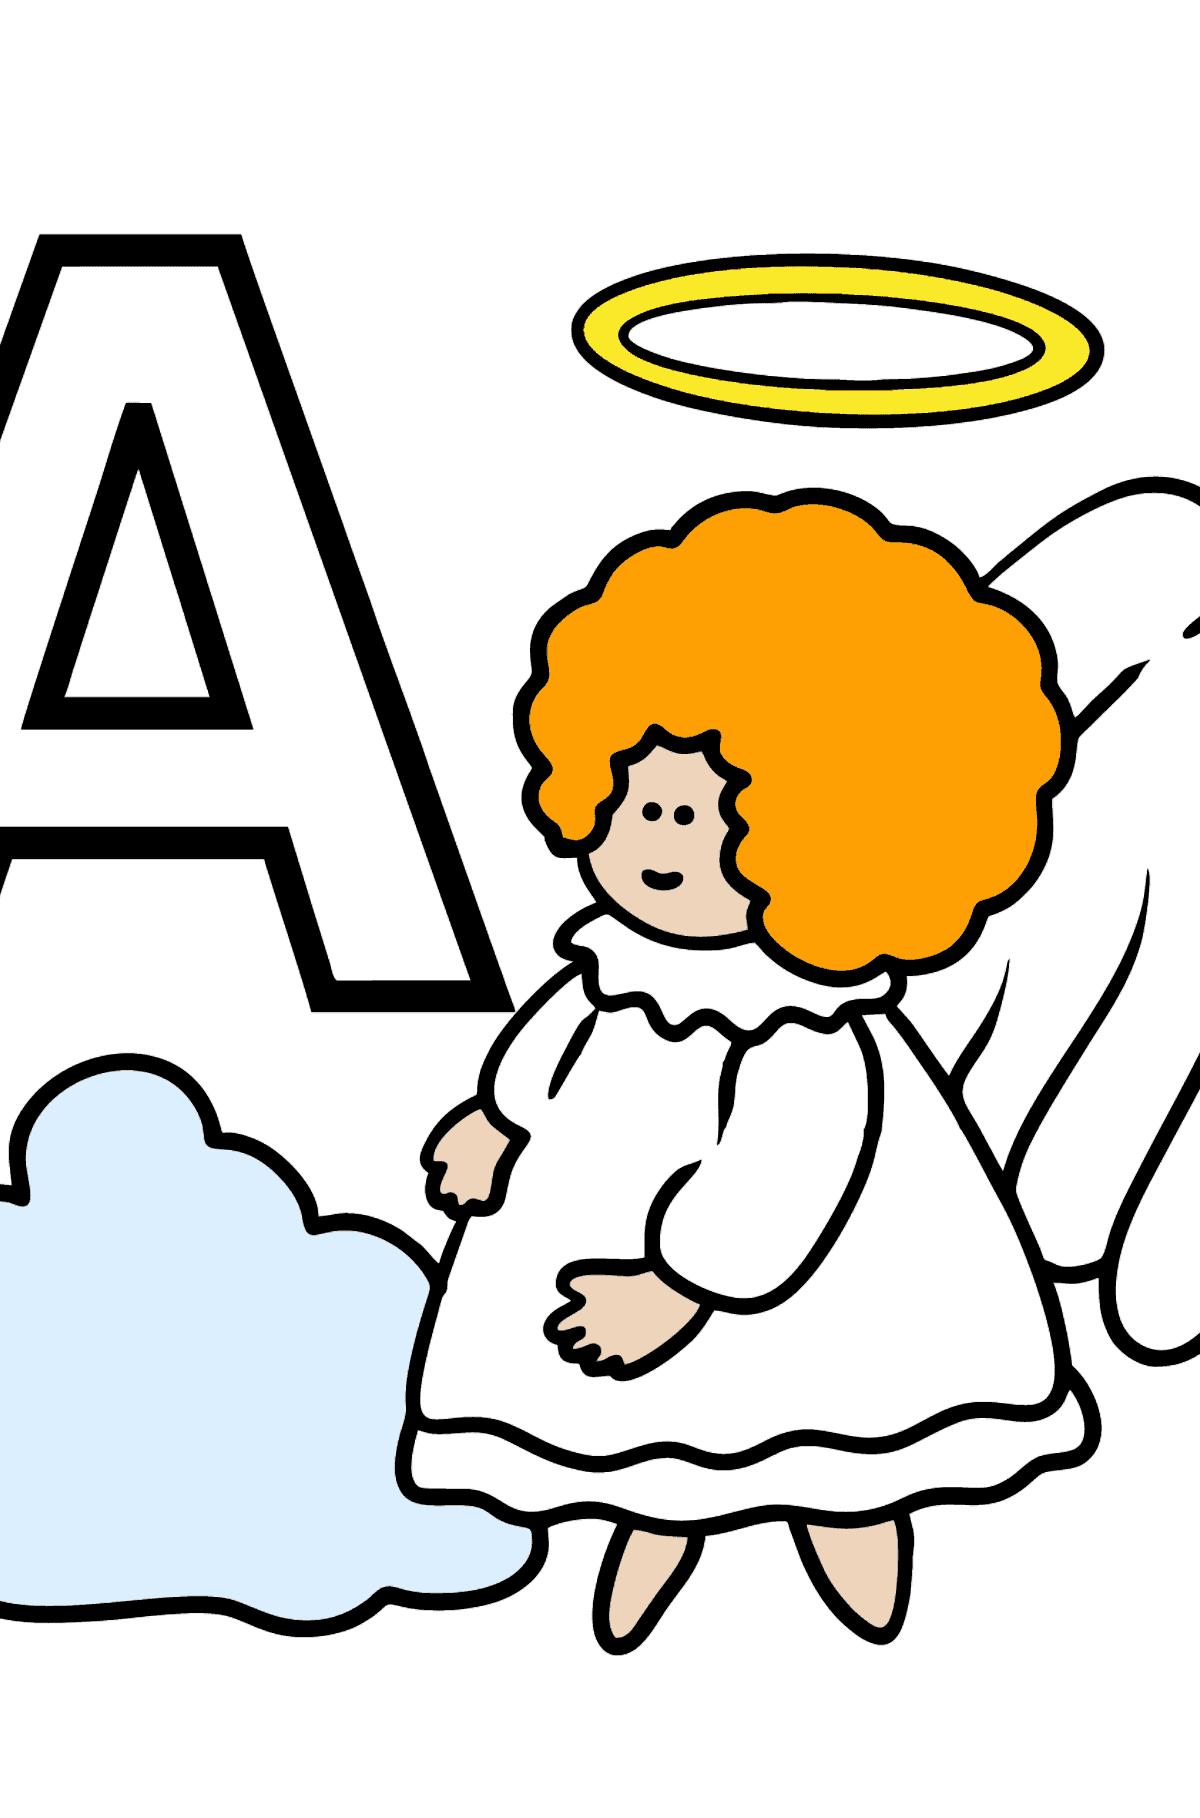 Раскраска Русская буква А - Ангел - Раскраски для Детей